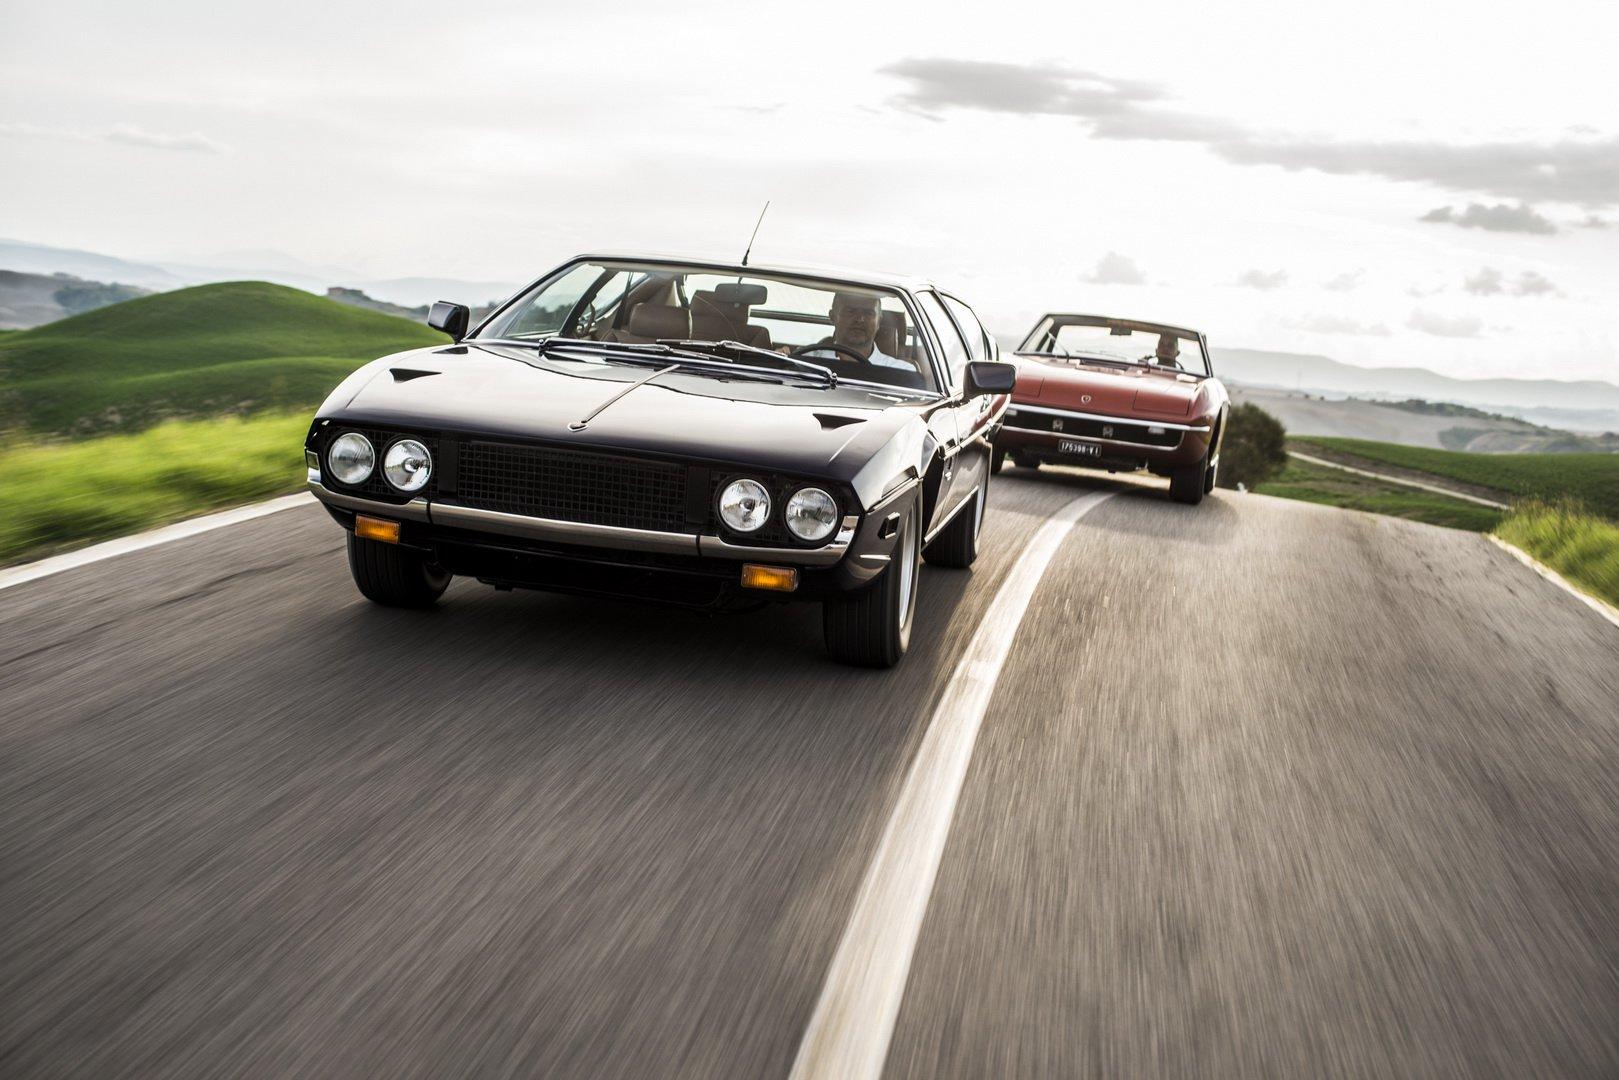 Lamborghini Islero and Espada 50th anniversary (21)